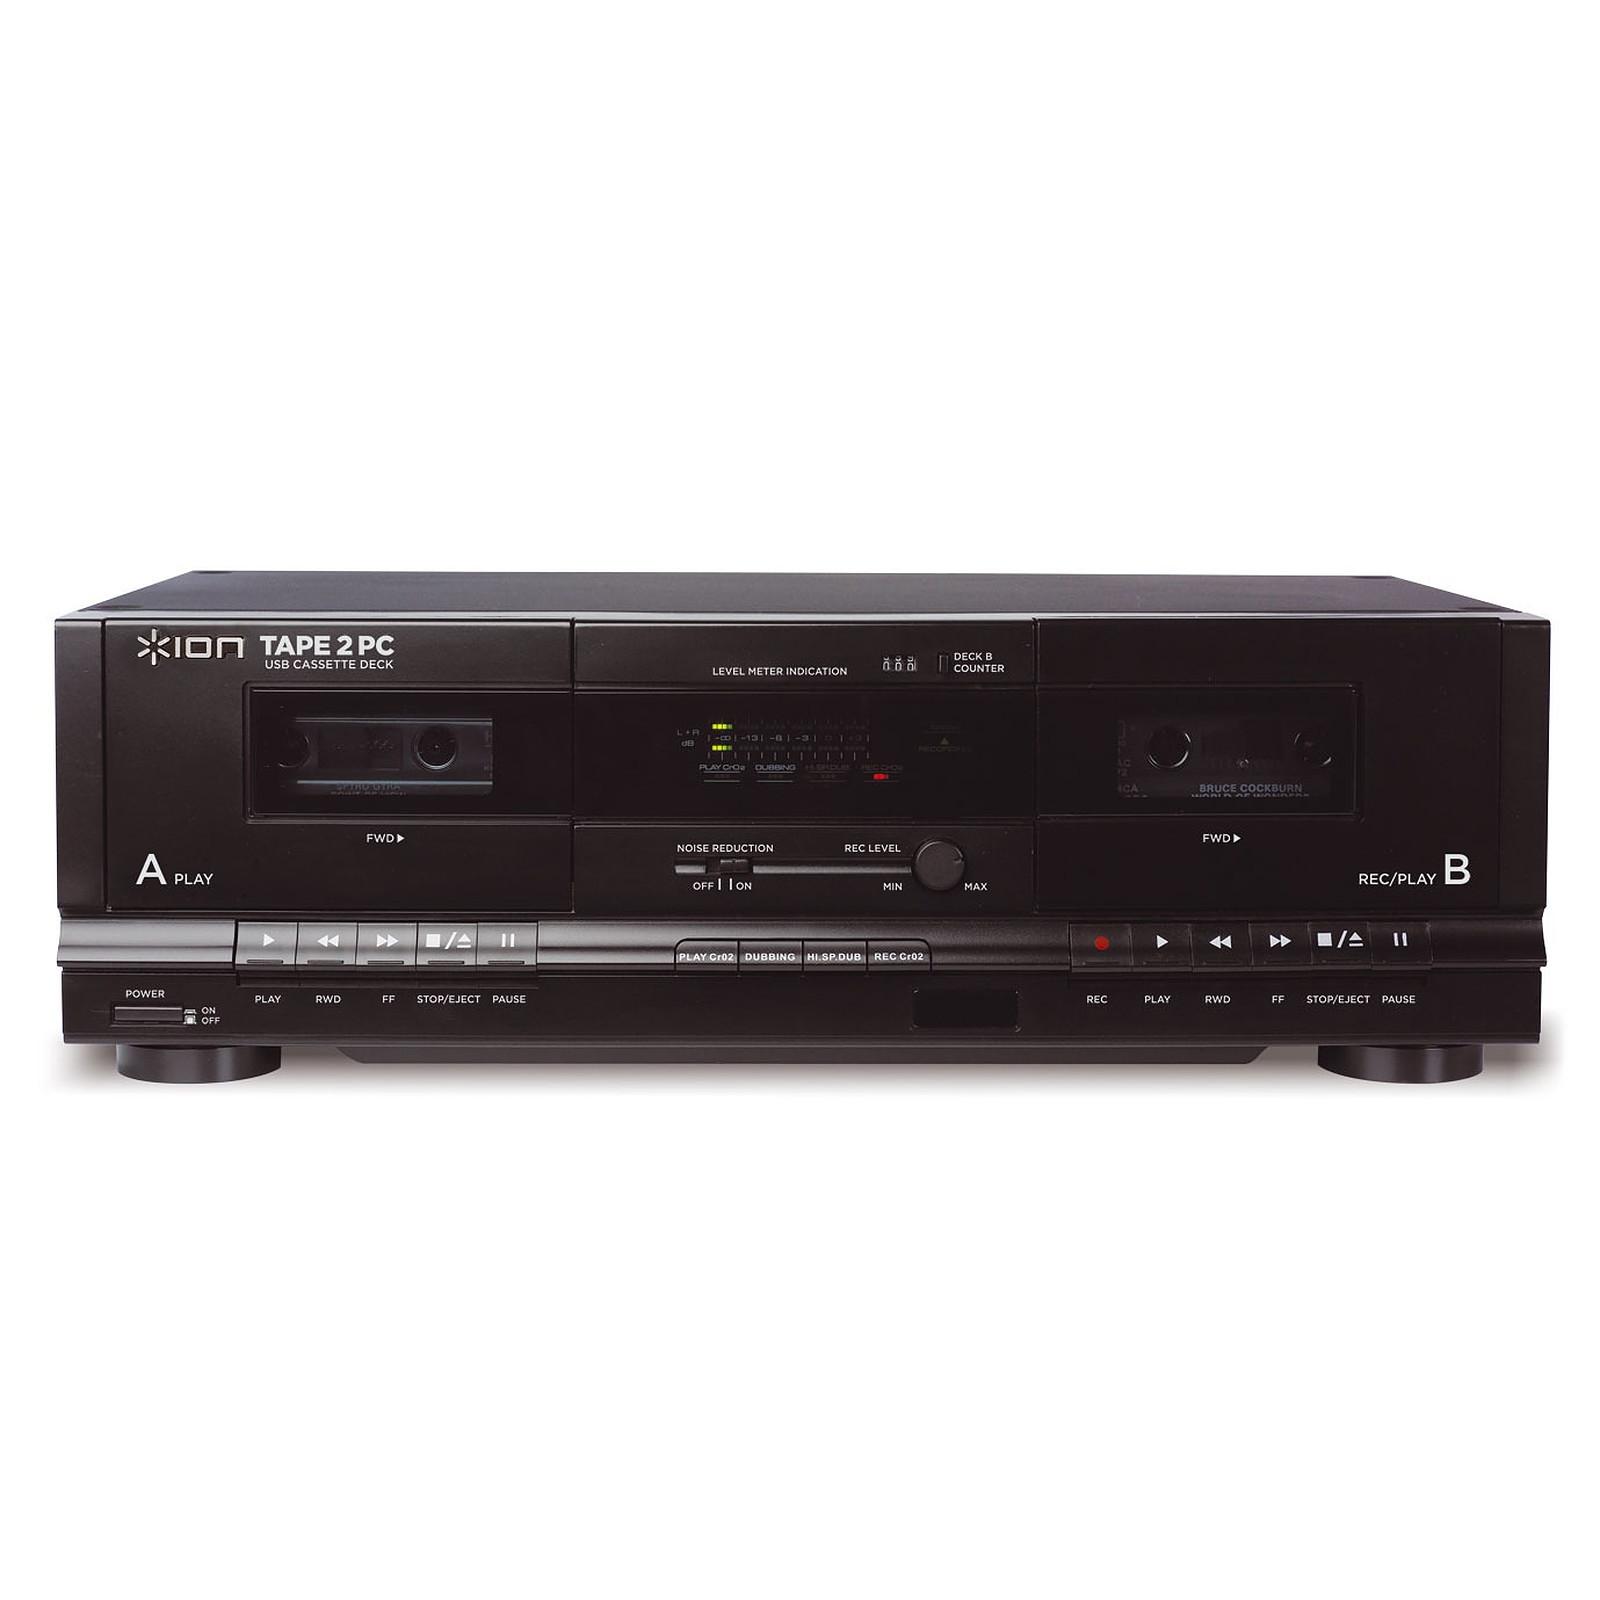 Ion Tape 2 PC